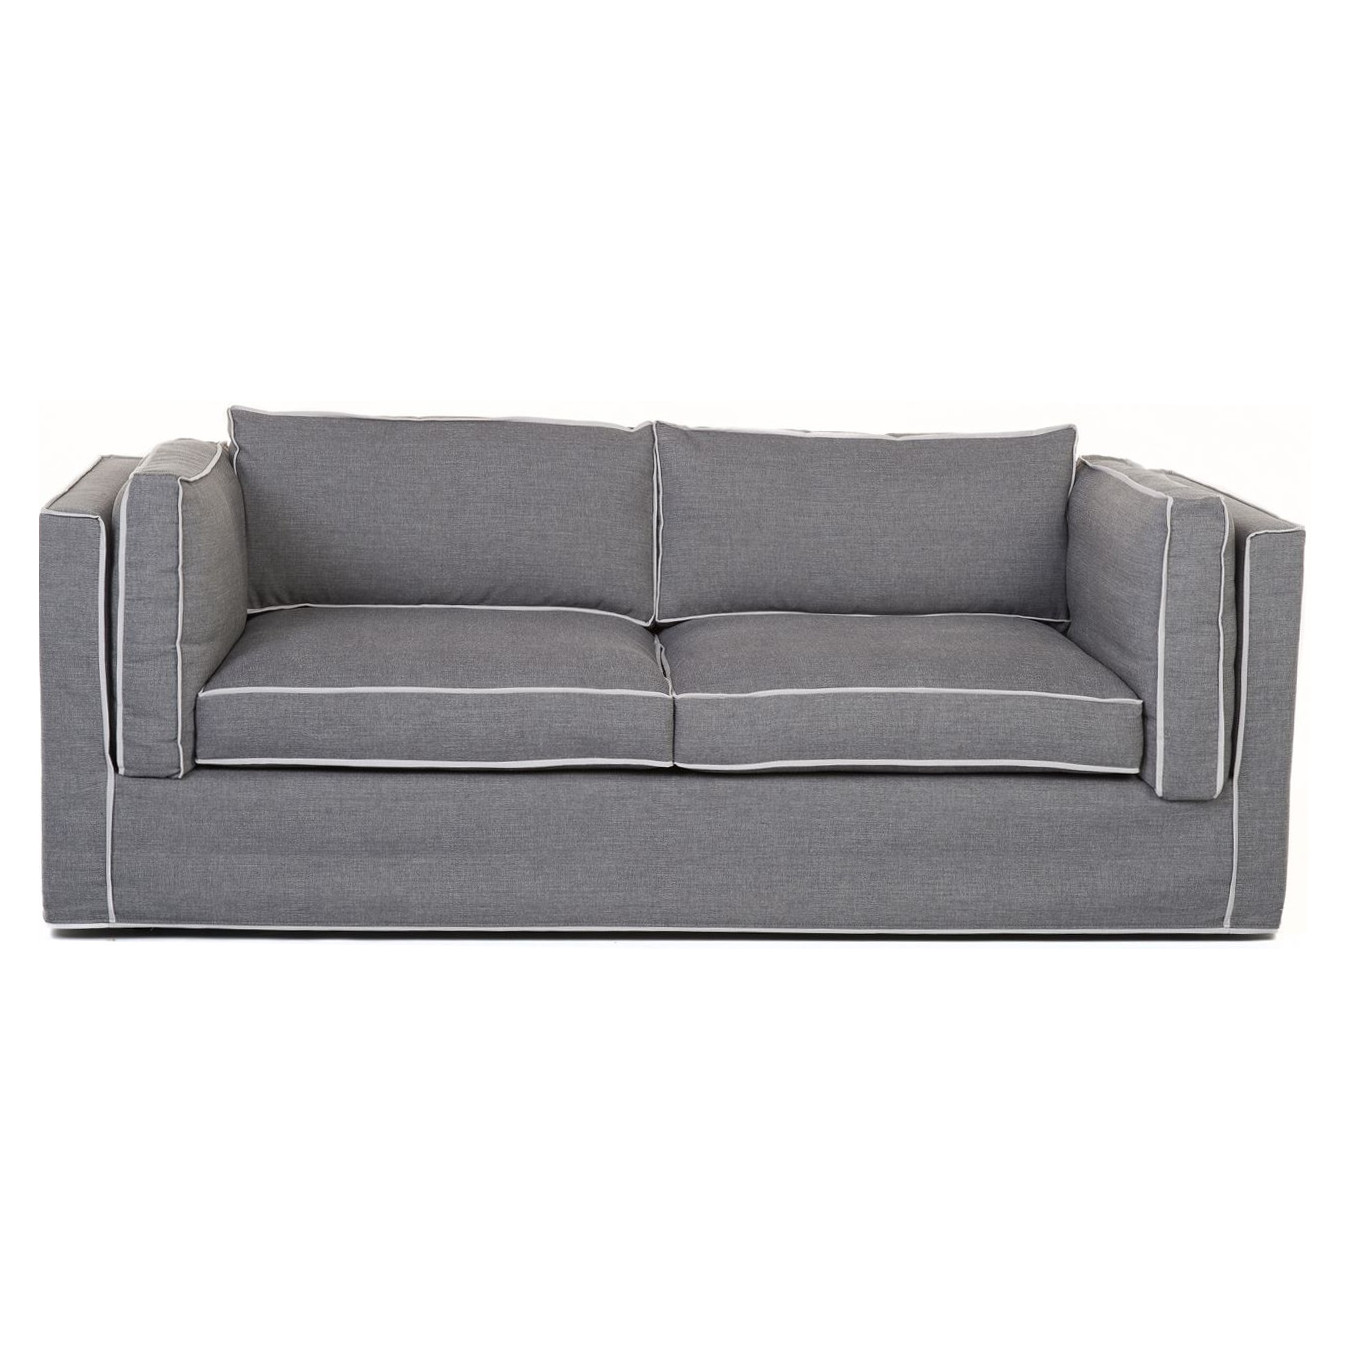 hussen sofa fontana grey mit kedernaht deko salon online. Black Bedroom Furniture Sets. Home Design Ideas